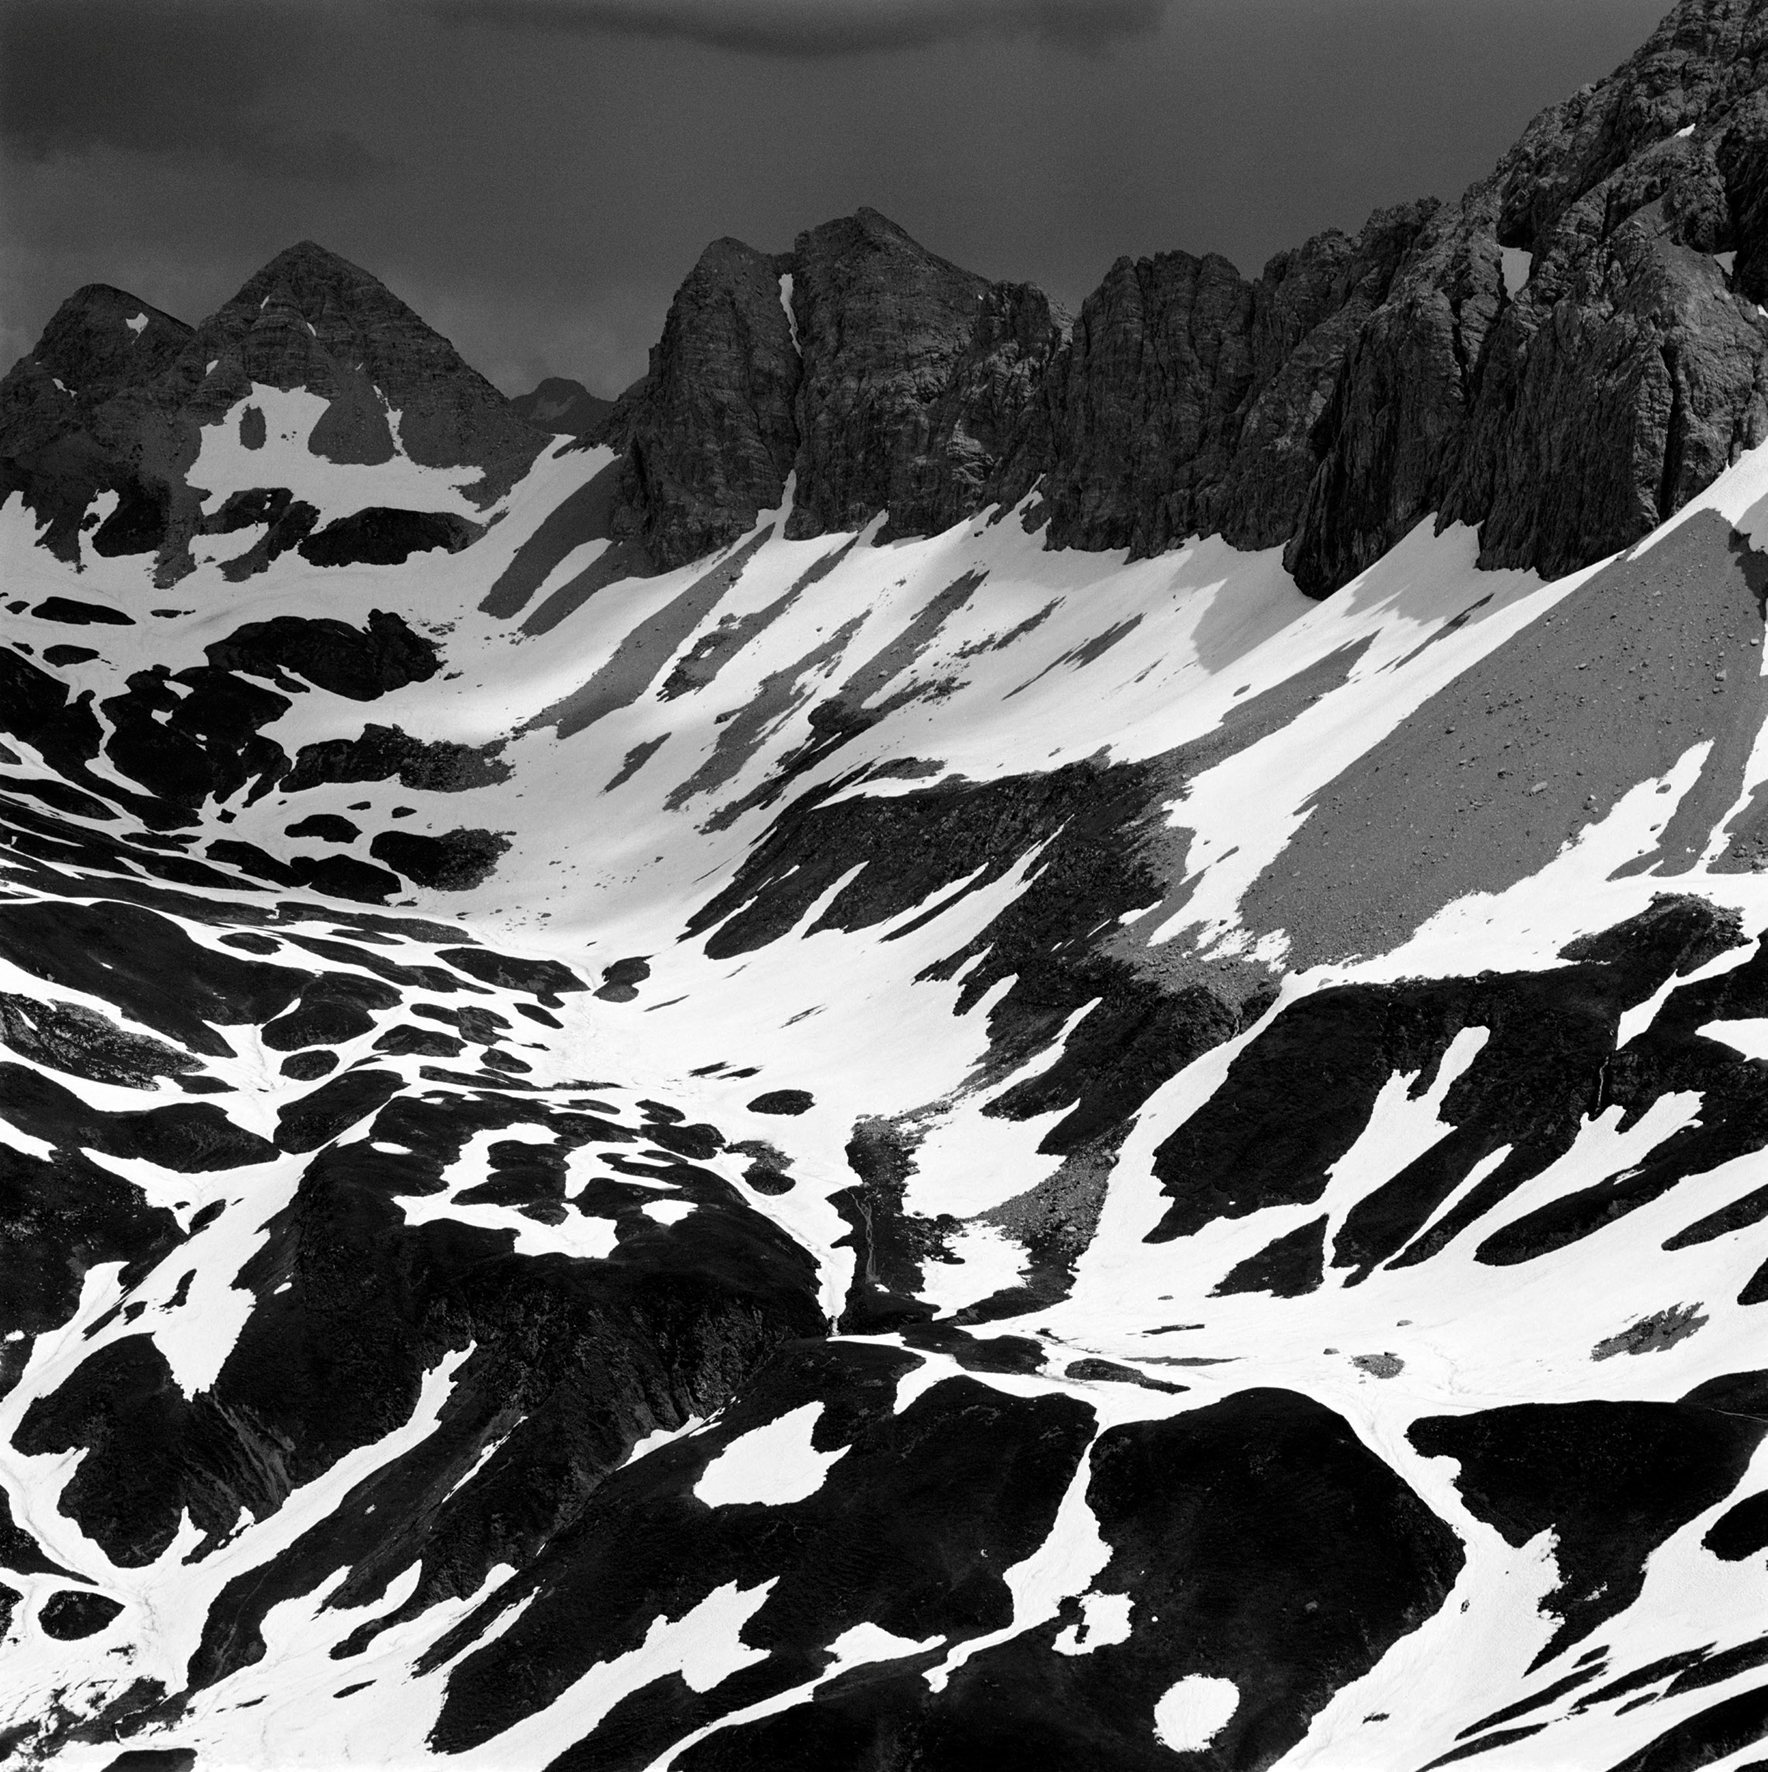 Rauhkopfscharte, Vorarlberg - 3,000m   Photo © 2016 Tim Hall. All rights reserved.  www.timhallphotography.com